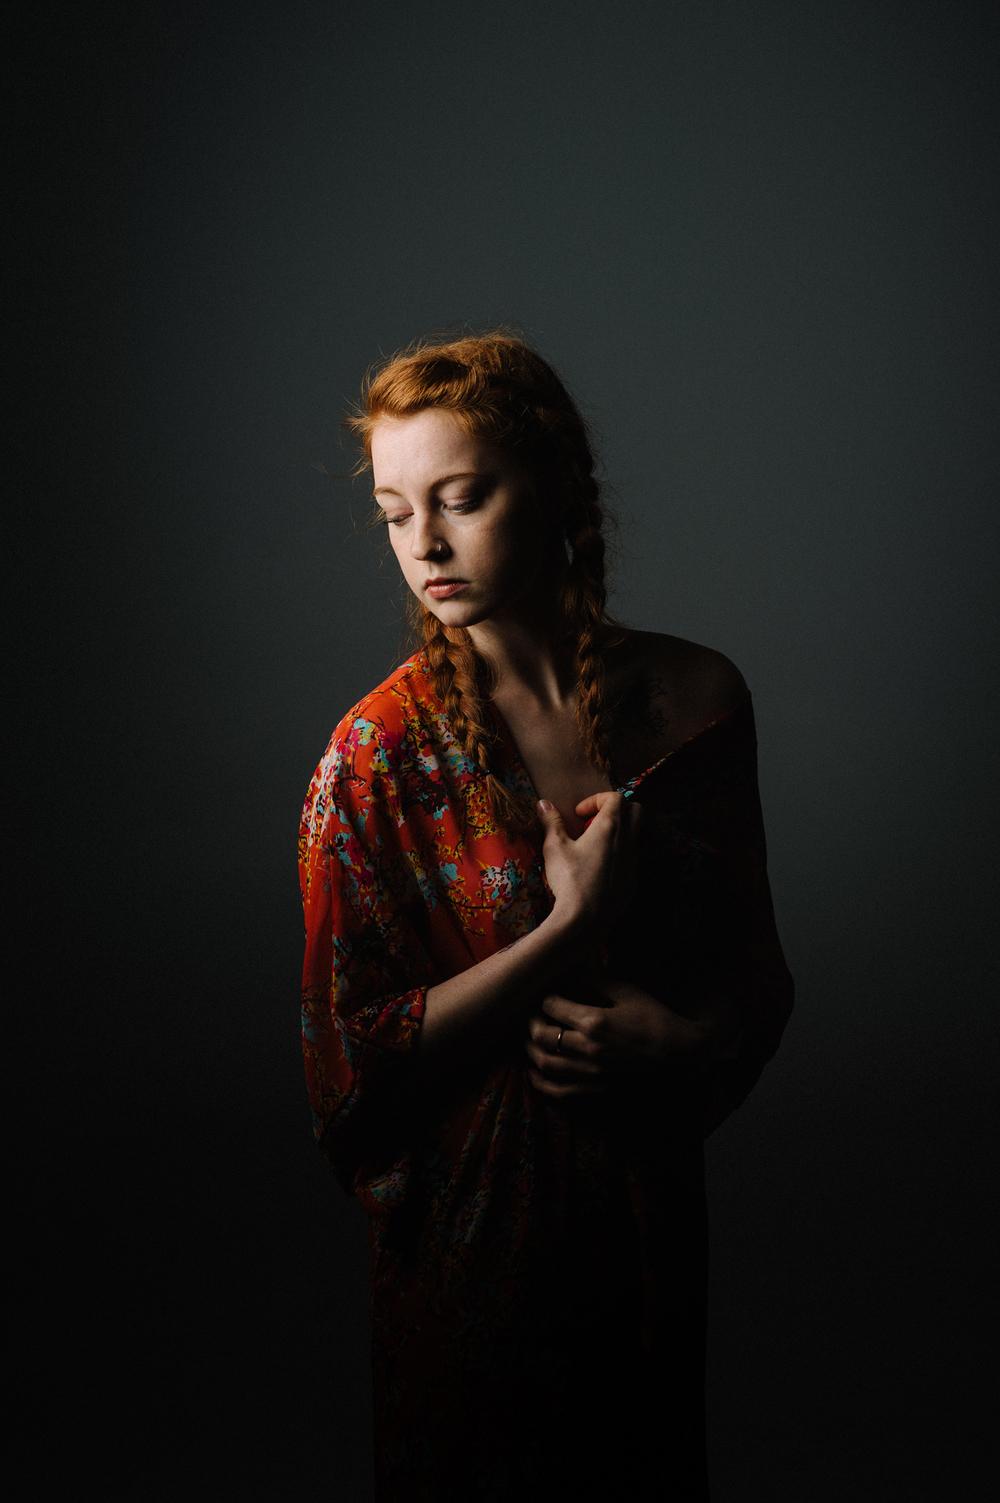 cady-studio-portraits-7833.jpg